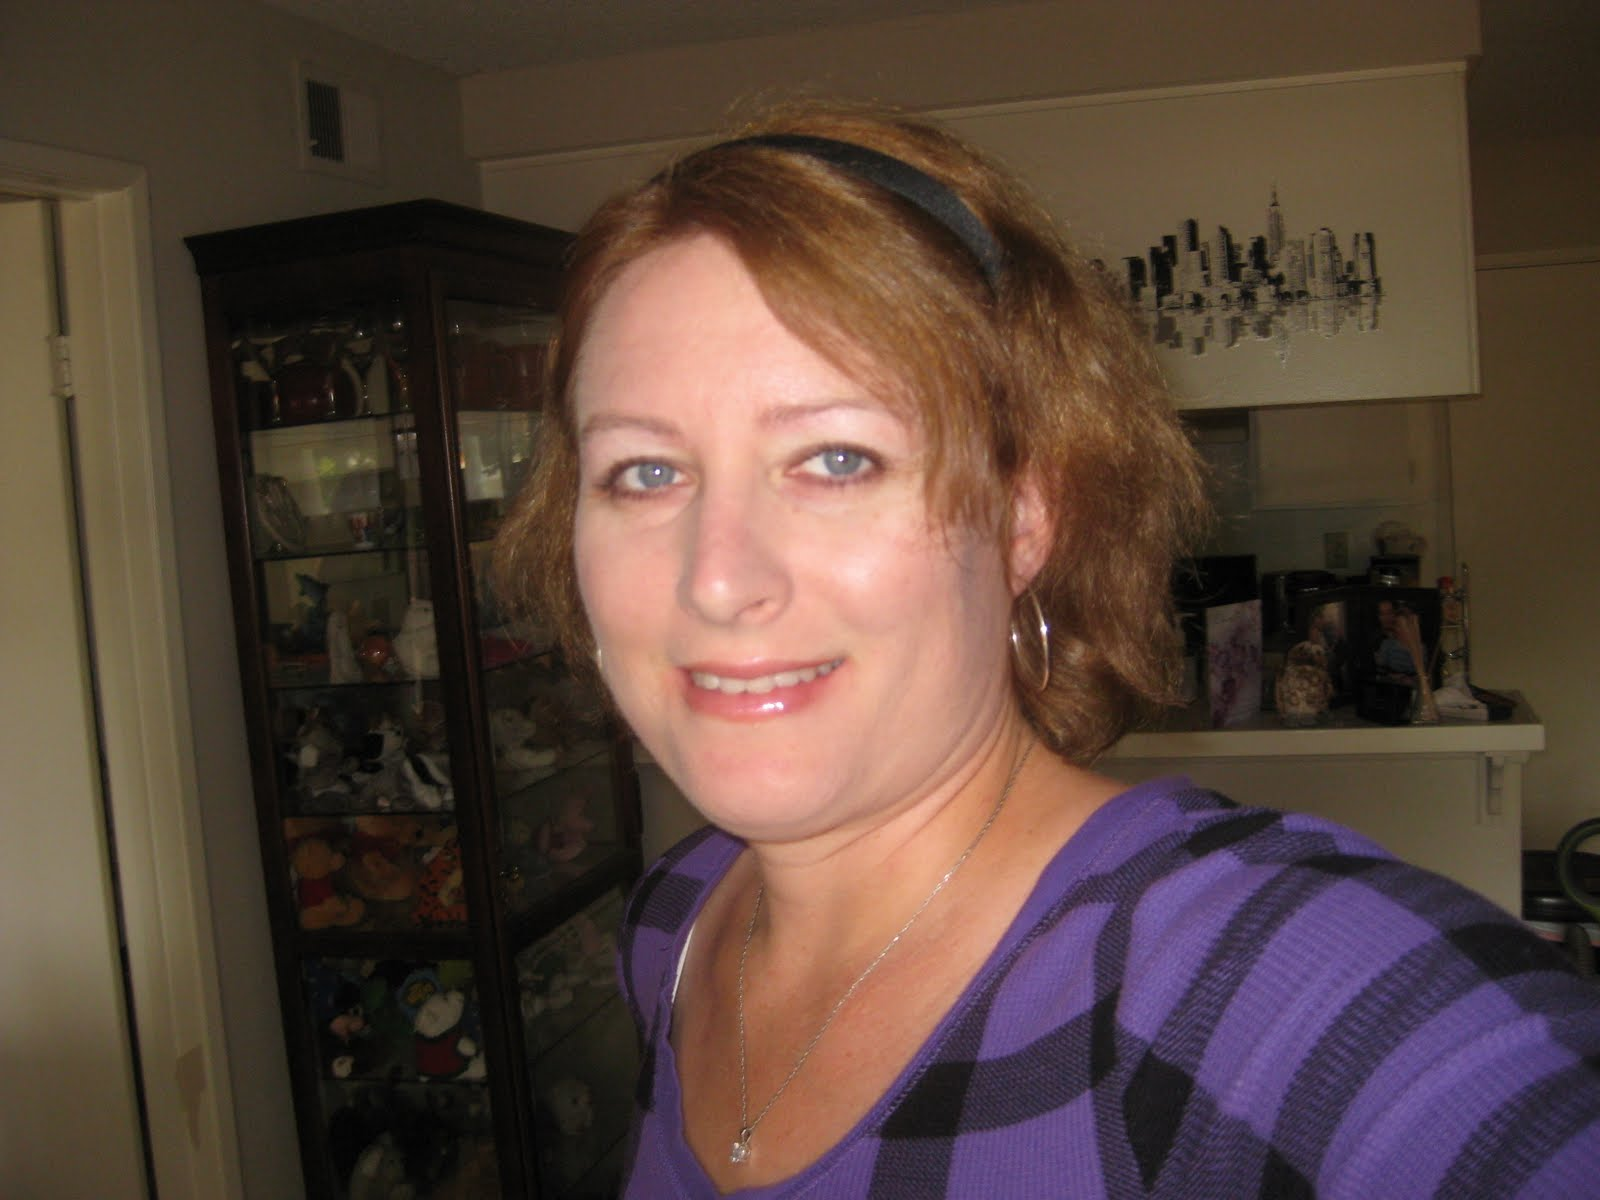 Natural Hair Dye Homemade Hair Dye Hair Dye Allergies 2015  Personal Blog